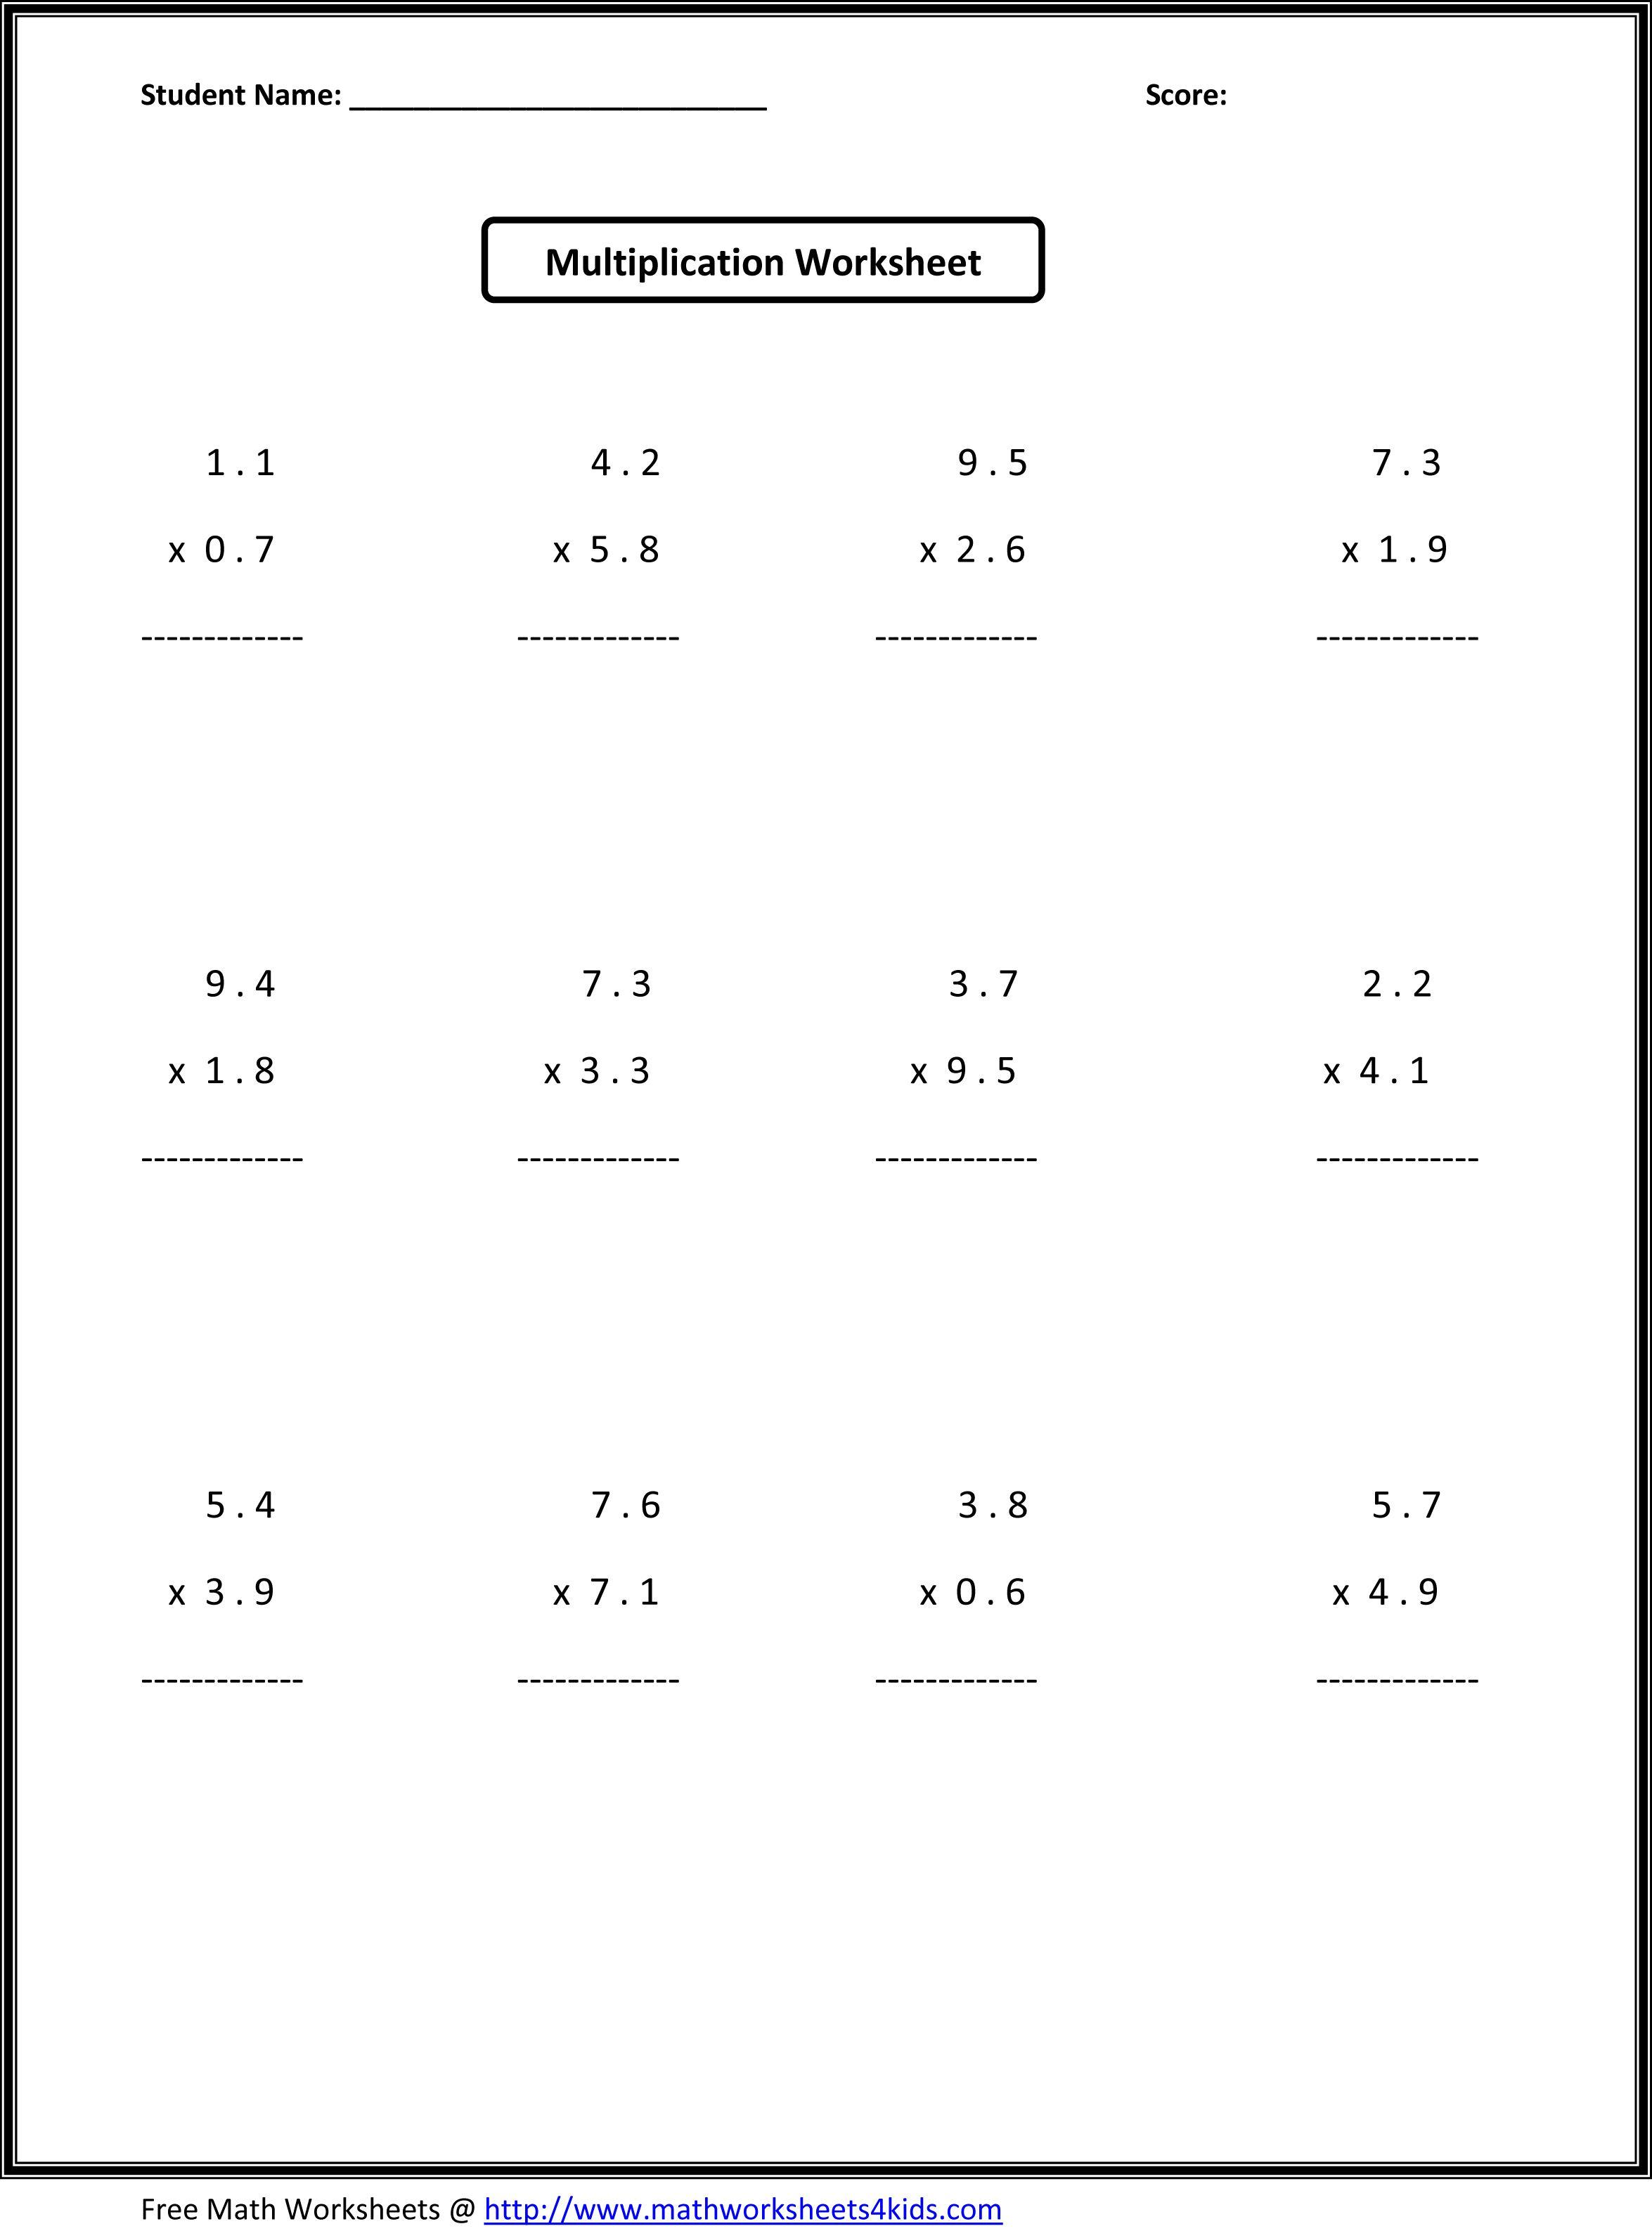 16 Best 5th Grade Ratio Worksheets Images On Best